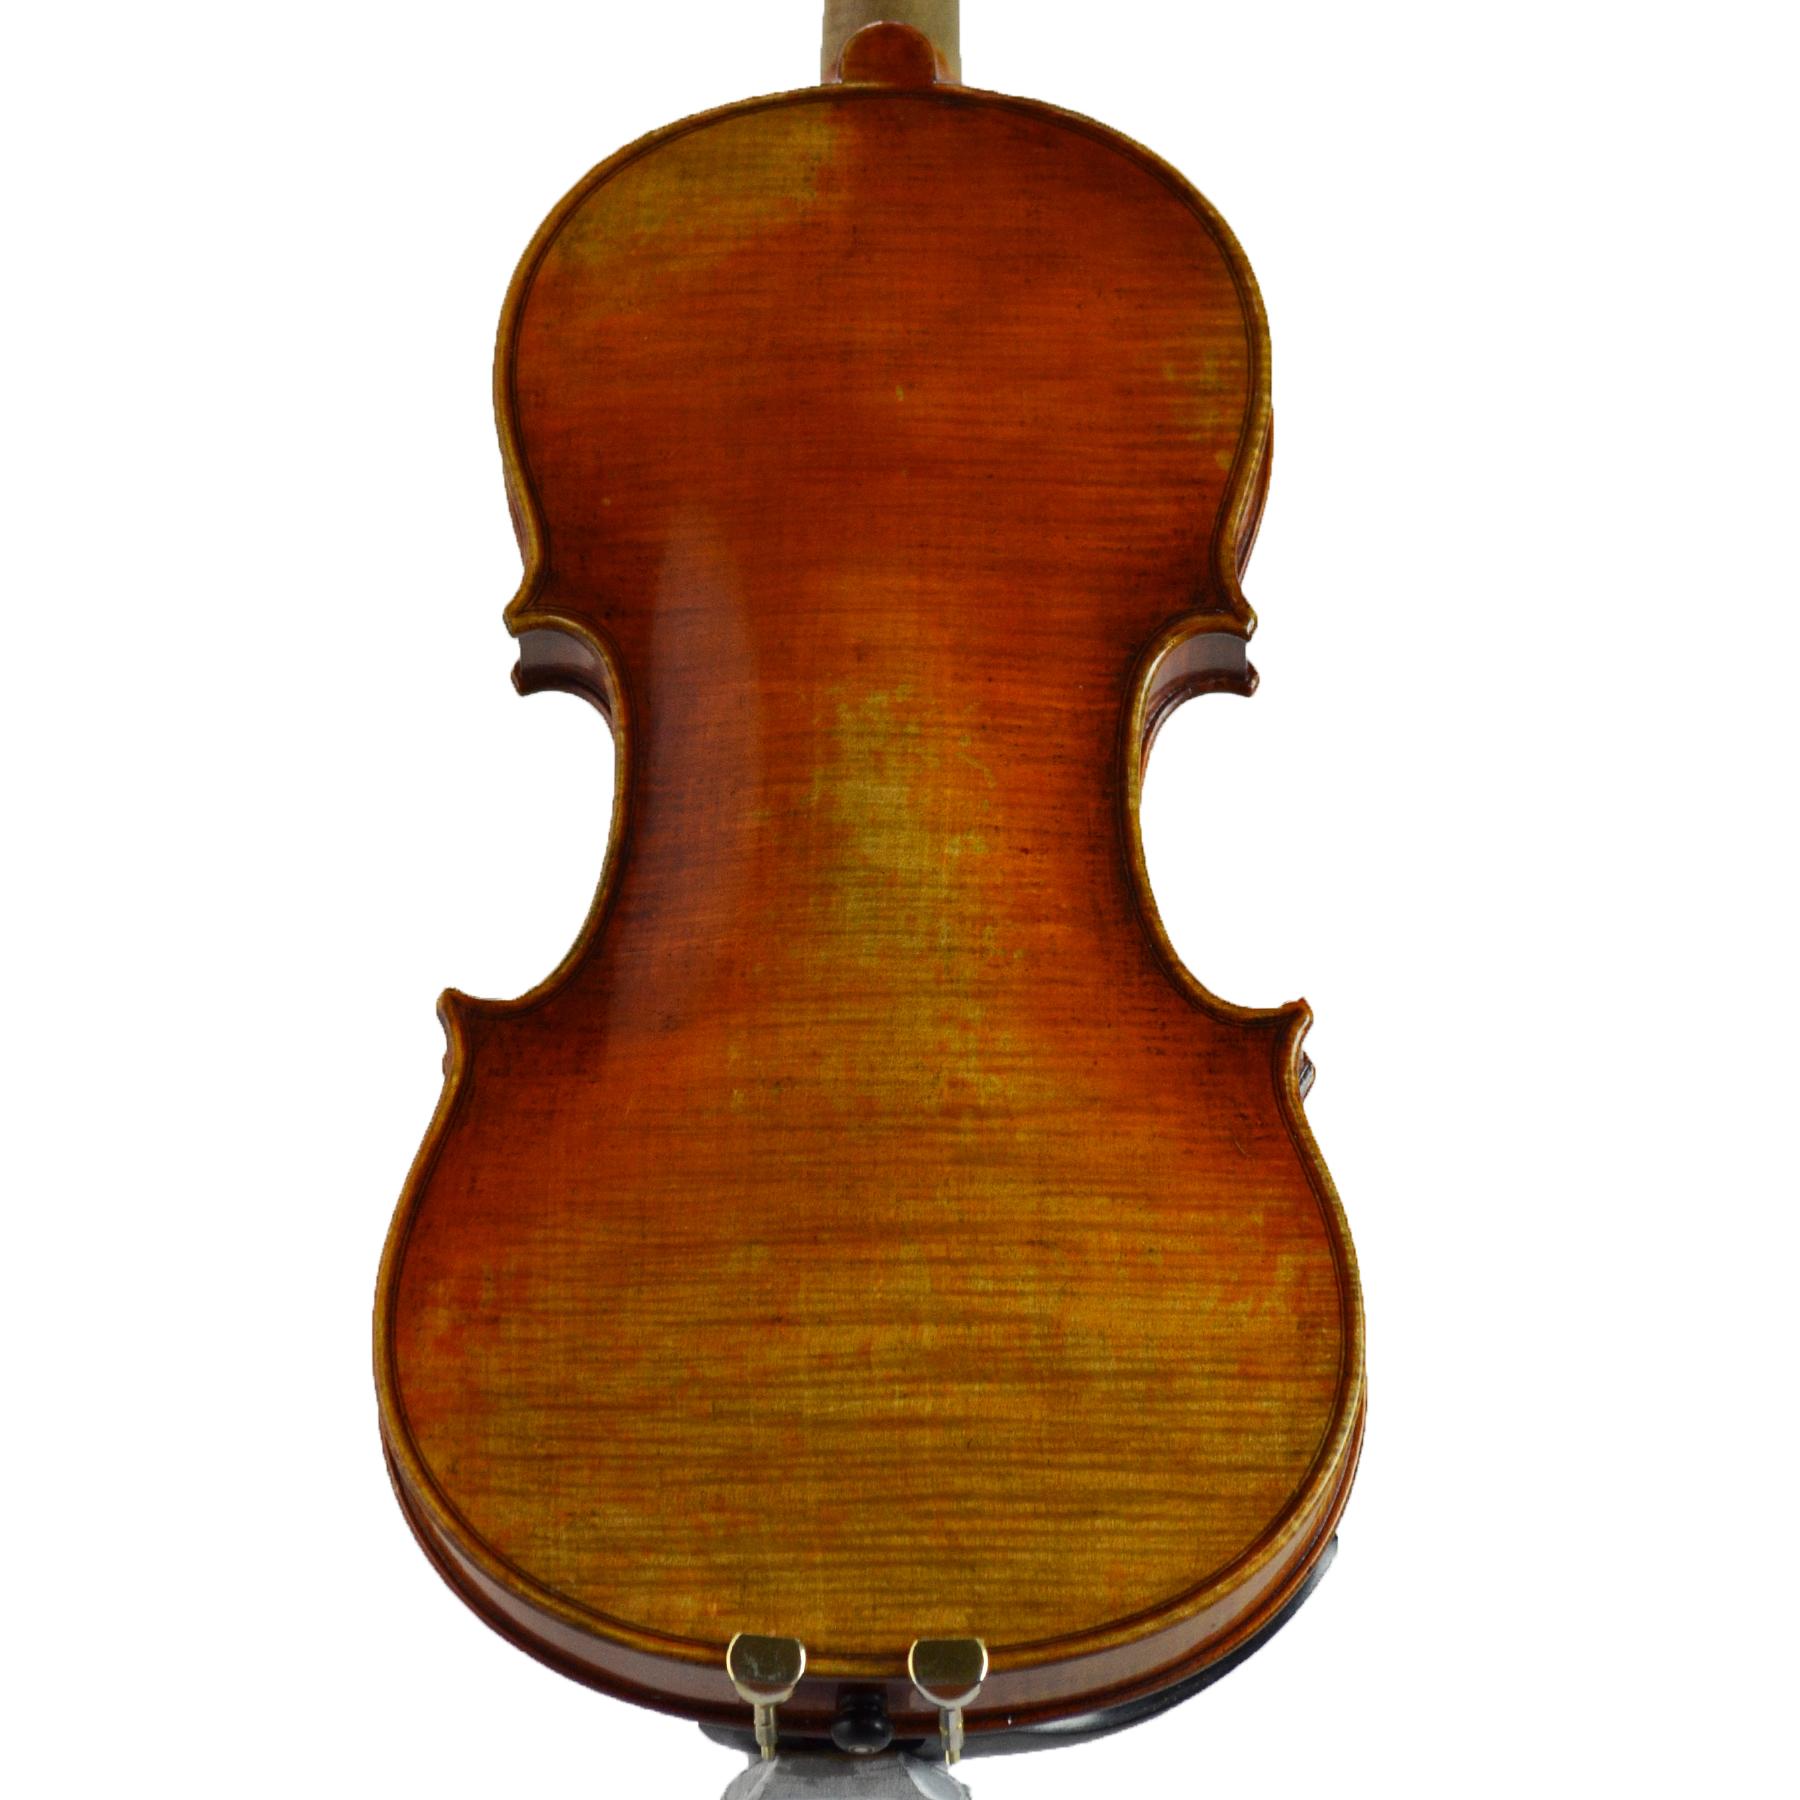 G215 2016 Mikhail Vitacek Violin in action